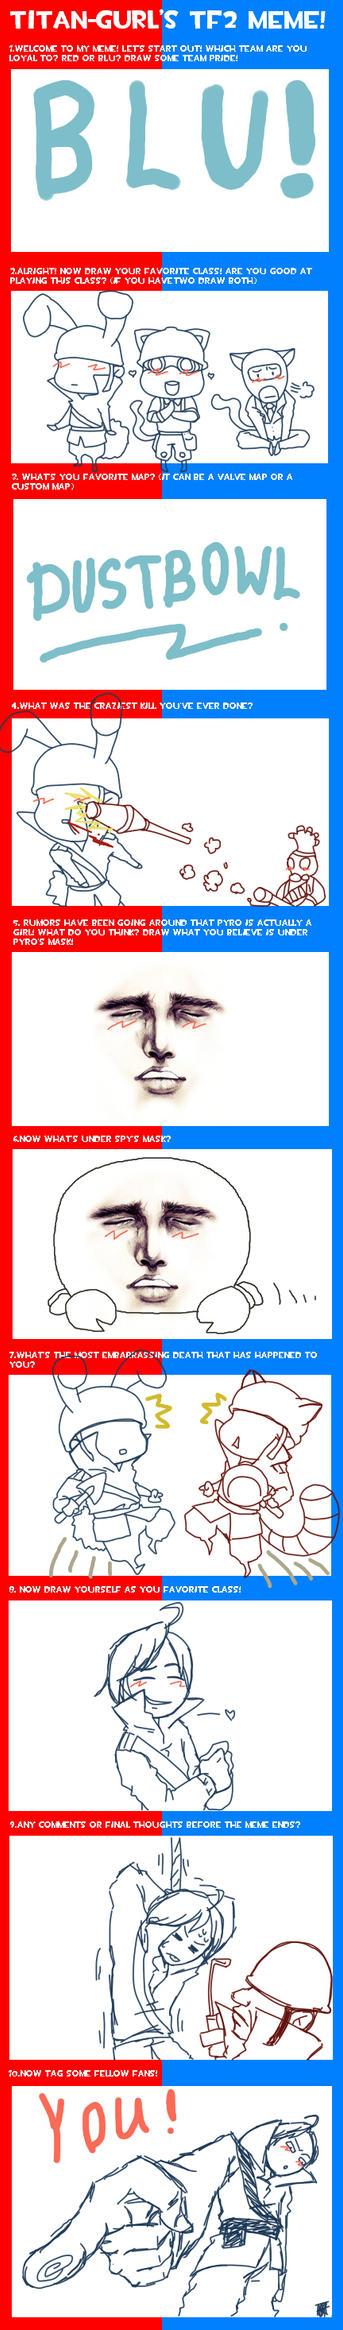 Team Fortress Meme by Titan_gurl by TMGR-COMICS